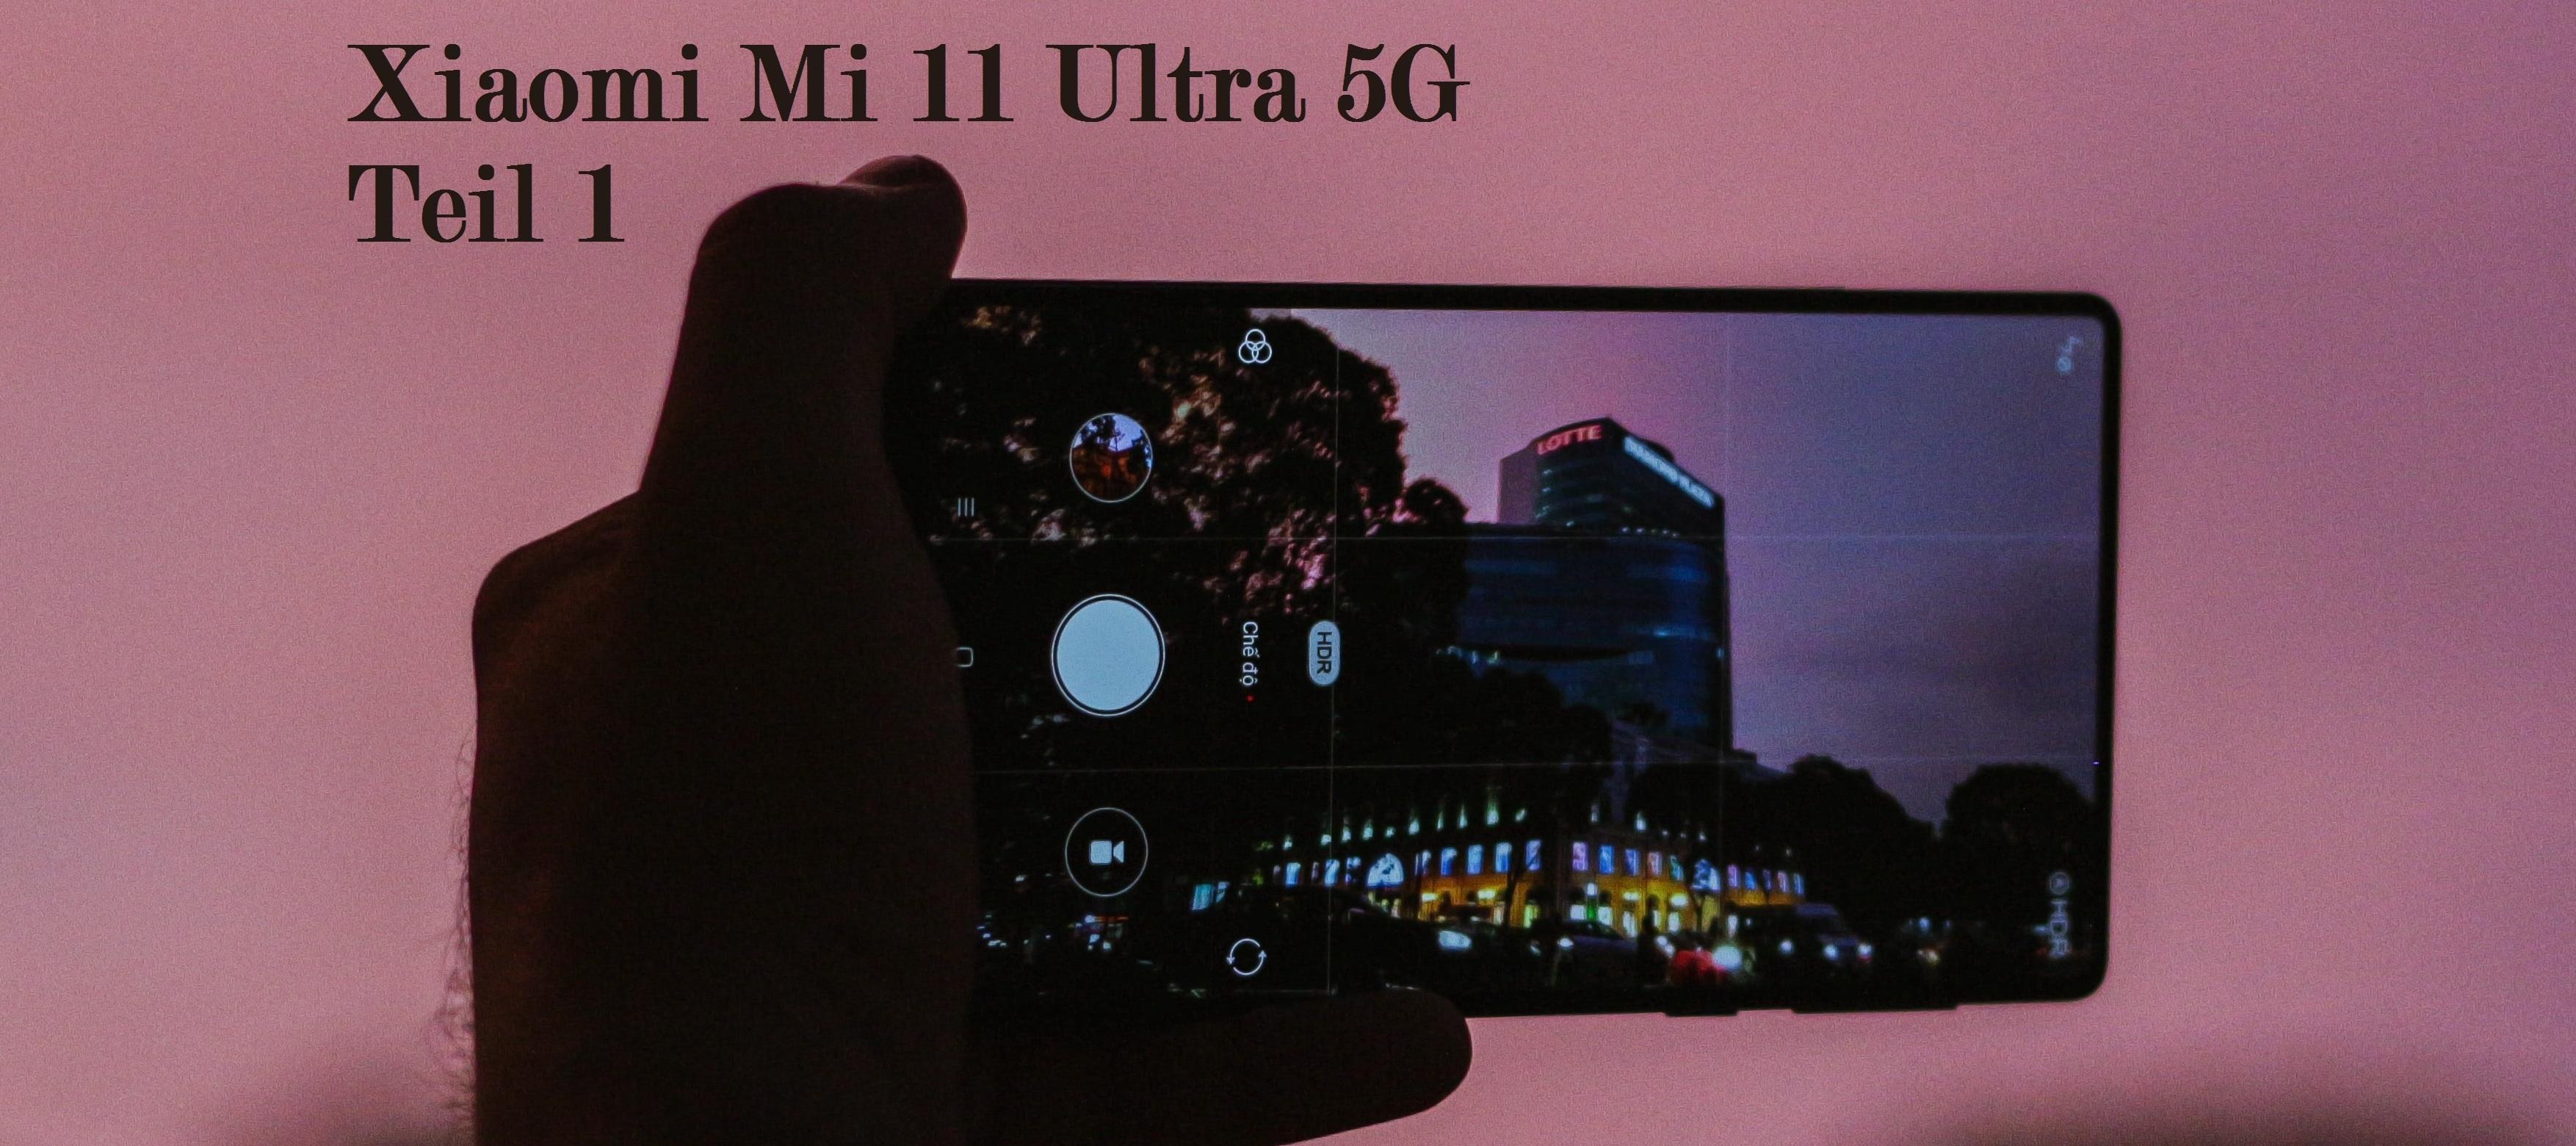 Hands-On Xiaomi Mi 11 Ultra 5G